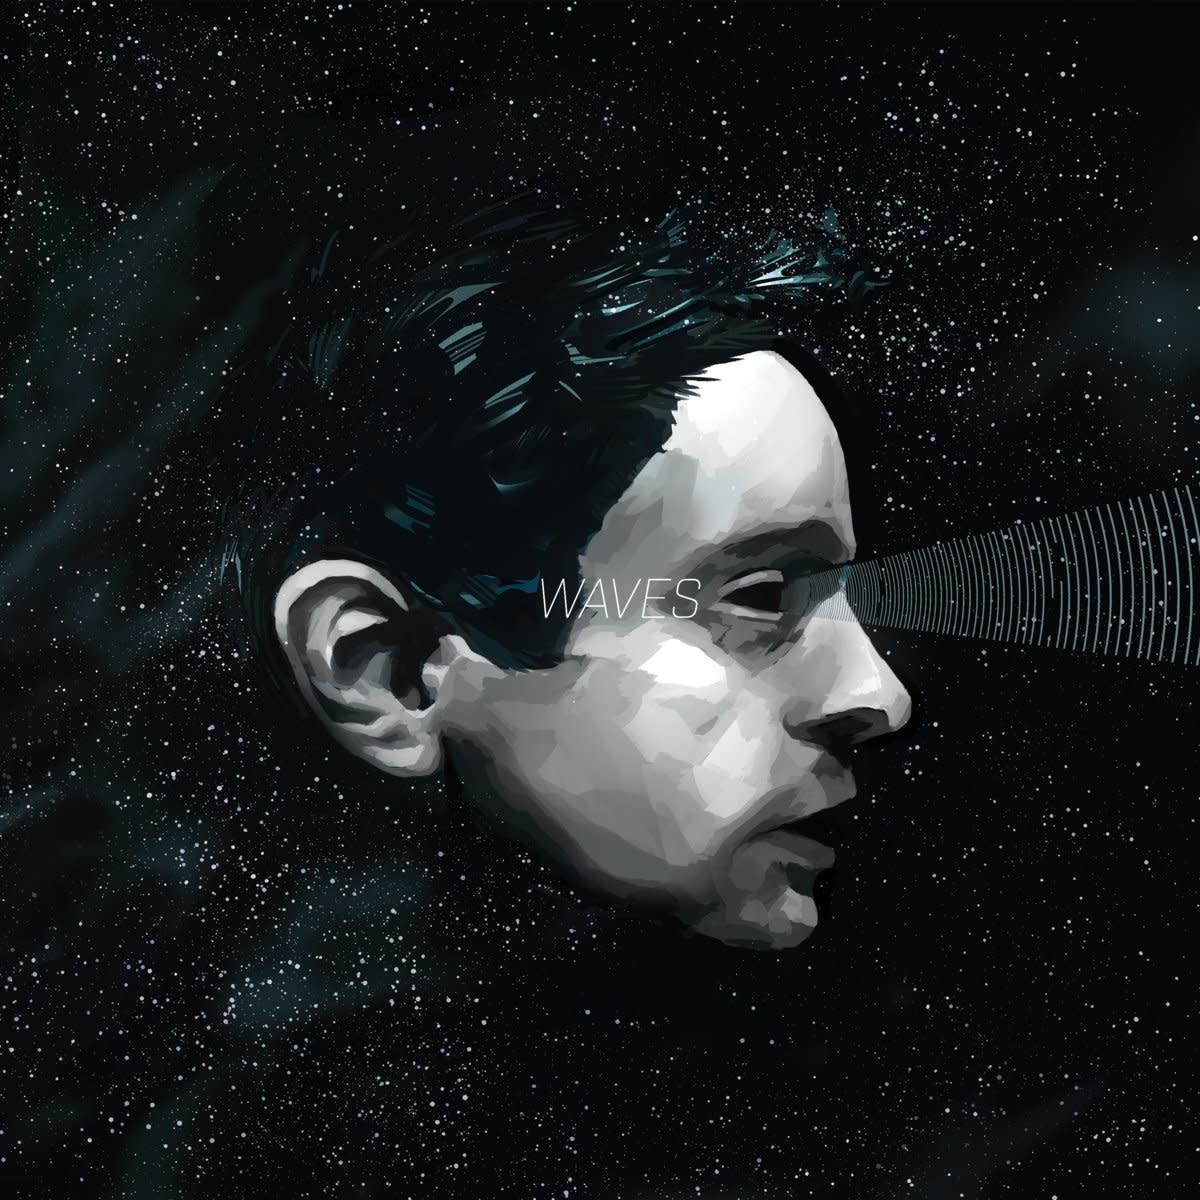 synth-album-review-waves-by-daniel-quasar